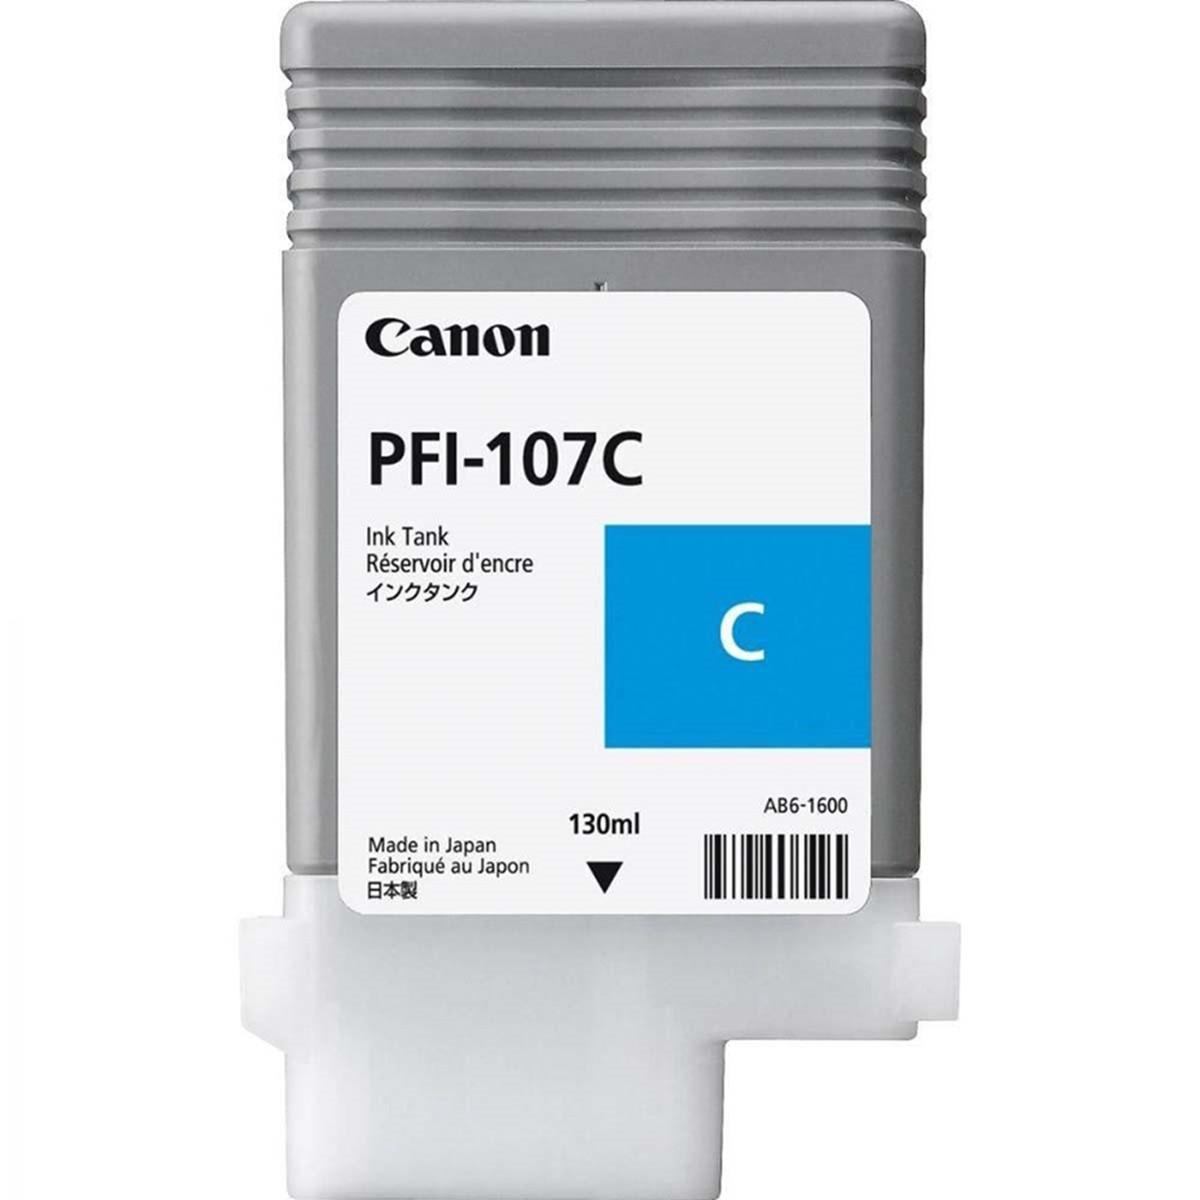 Cartucho de Tinta Canon PFI-107 PFI-107C Ciano | Original 130ml